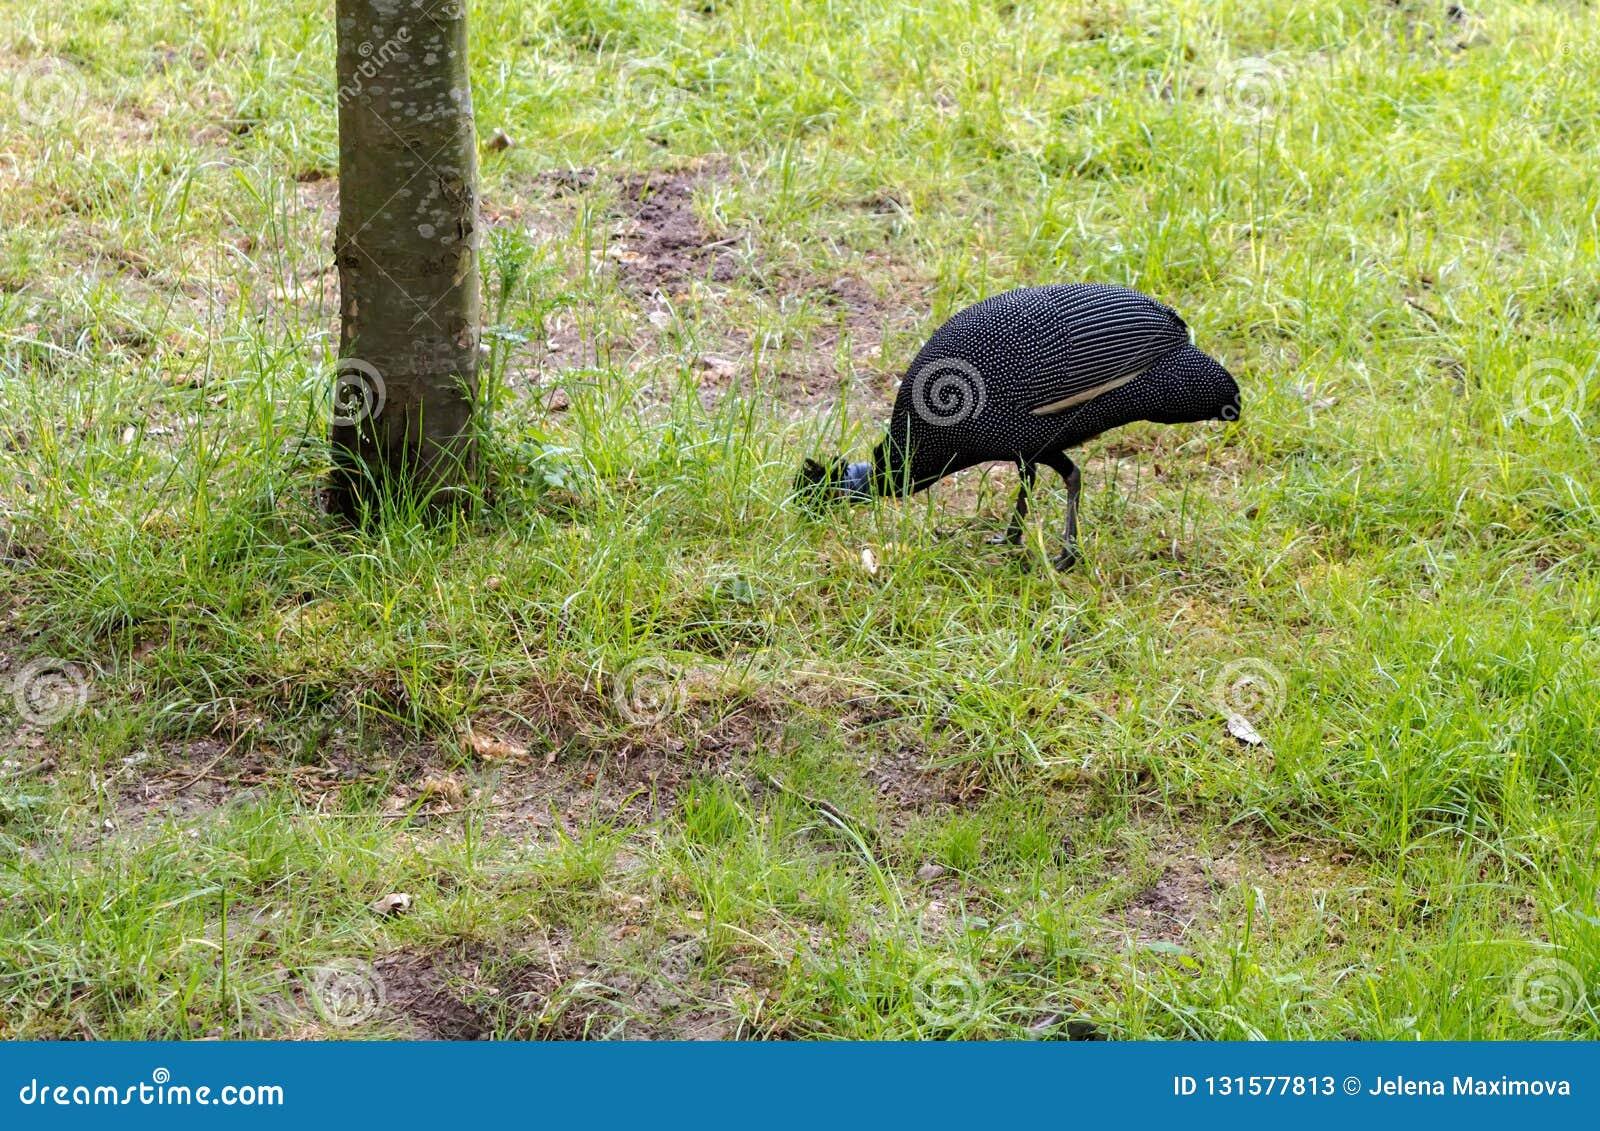 The Crested Guineafowl Guttera Pucherani Bird Looking For